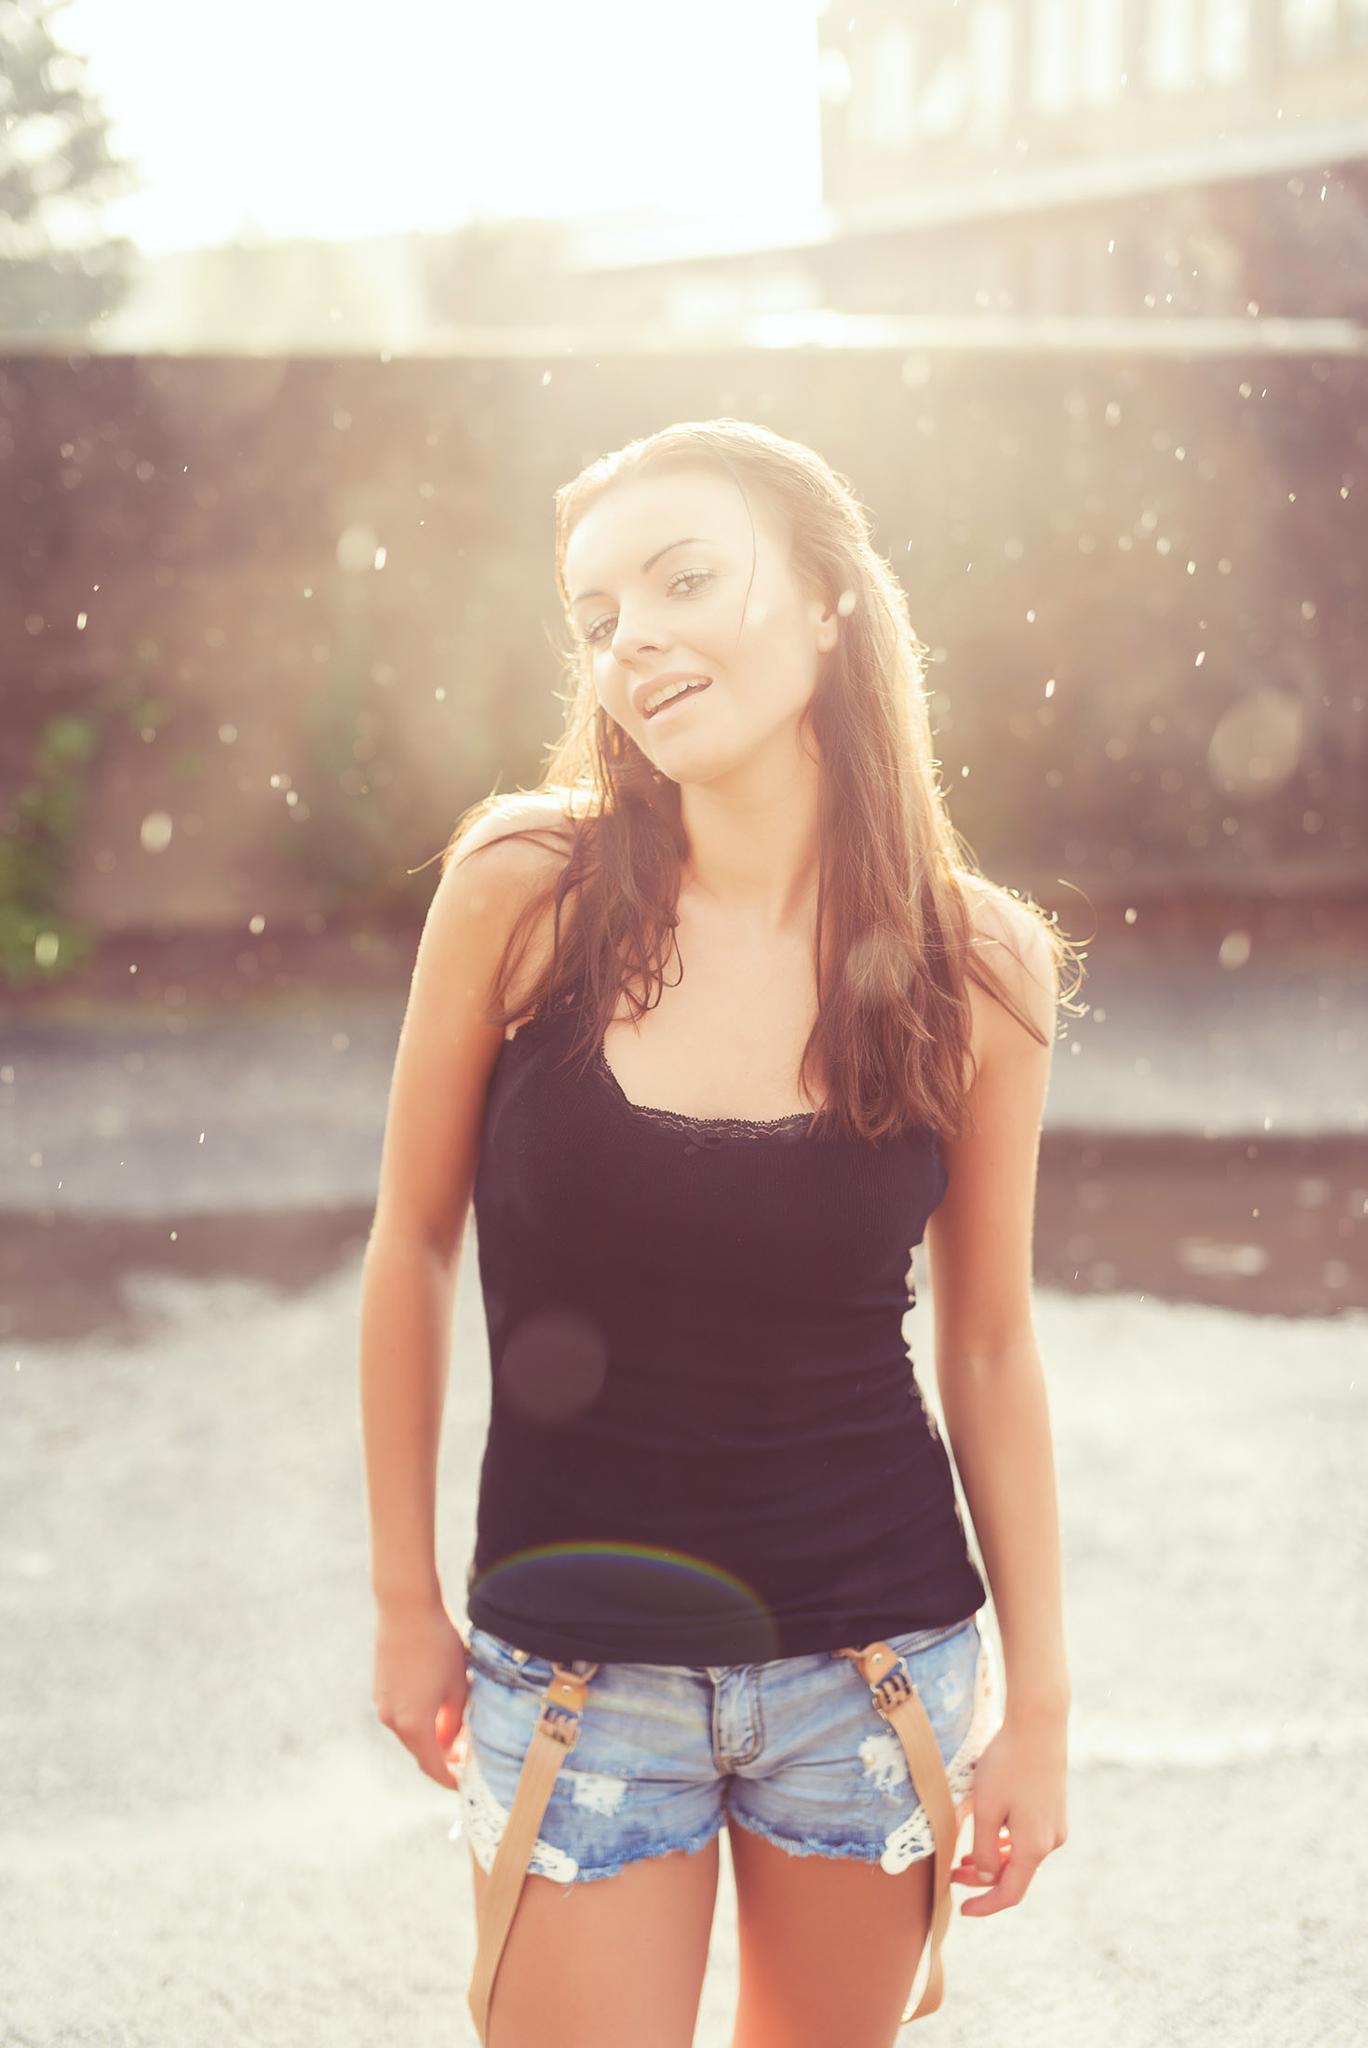 Klaudia in the sun & rain by Marian Pentek - Digihelion